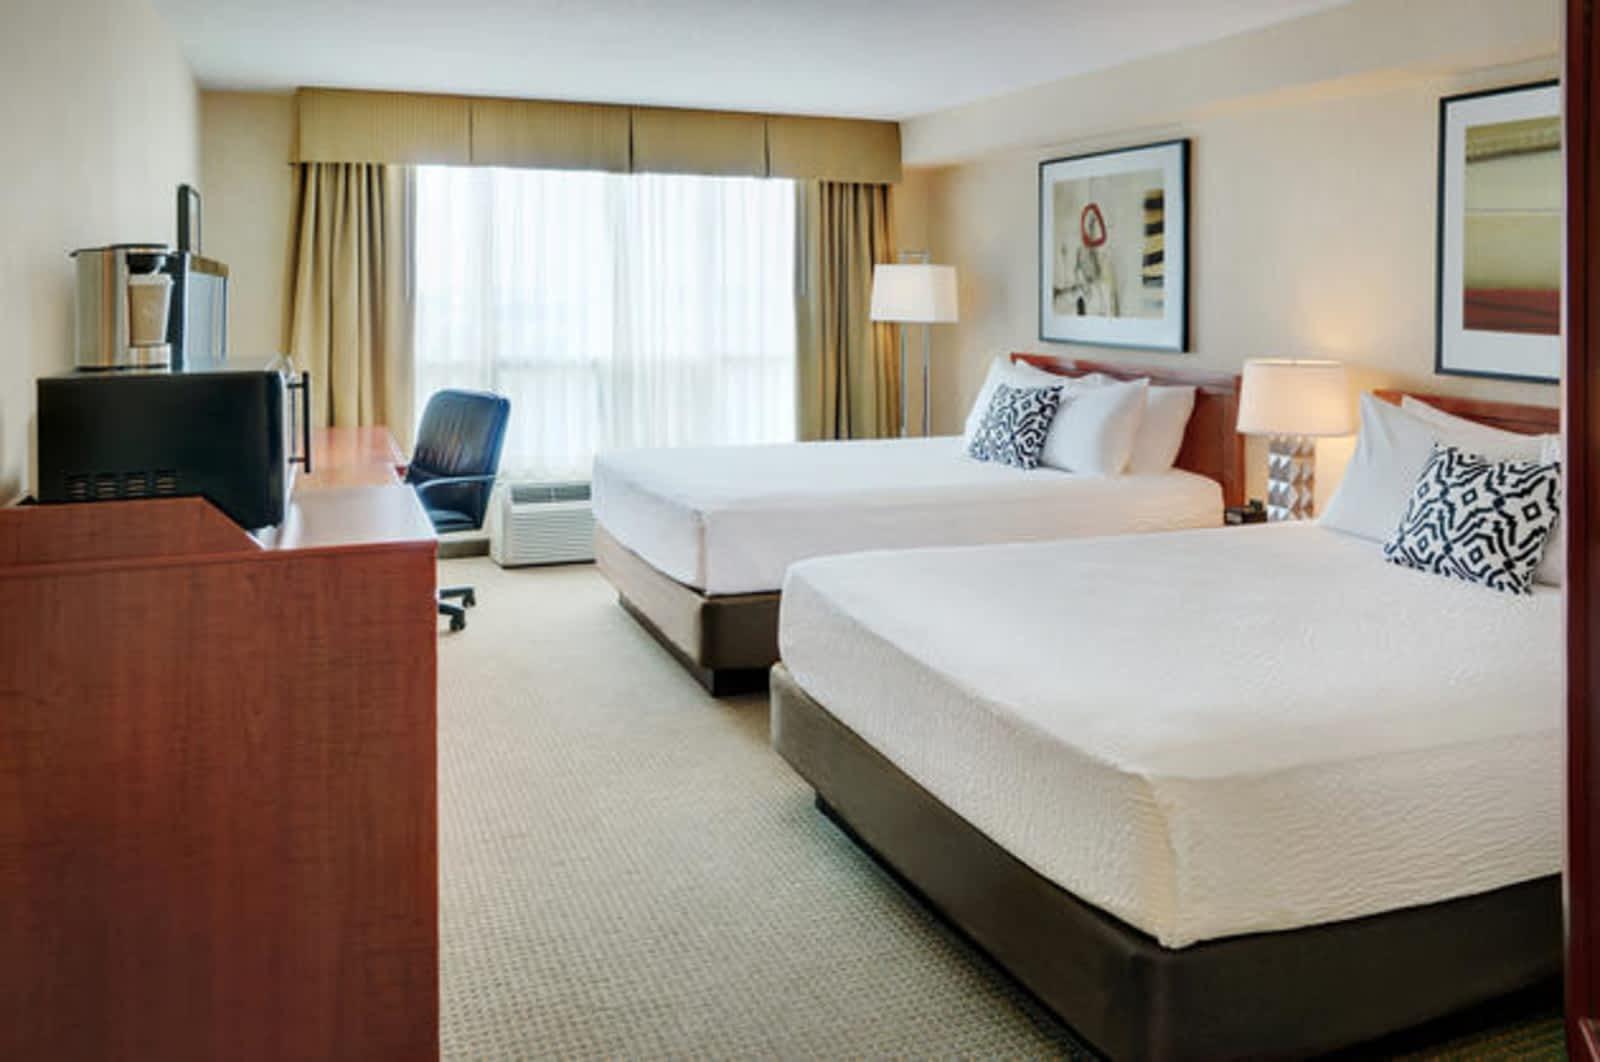 Radisson Hotel Kitchener Waterloo - Opening Hours - 2960 King Street ...